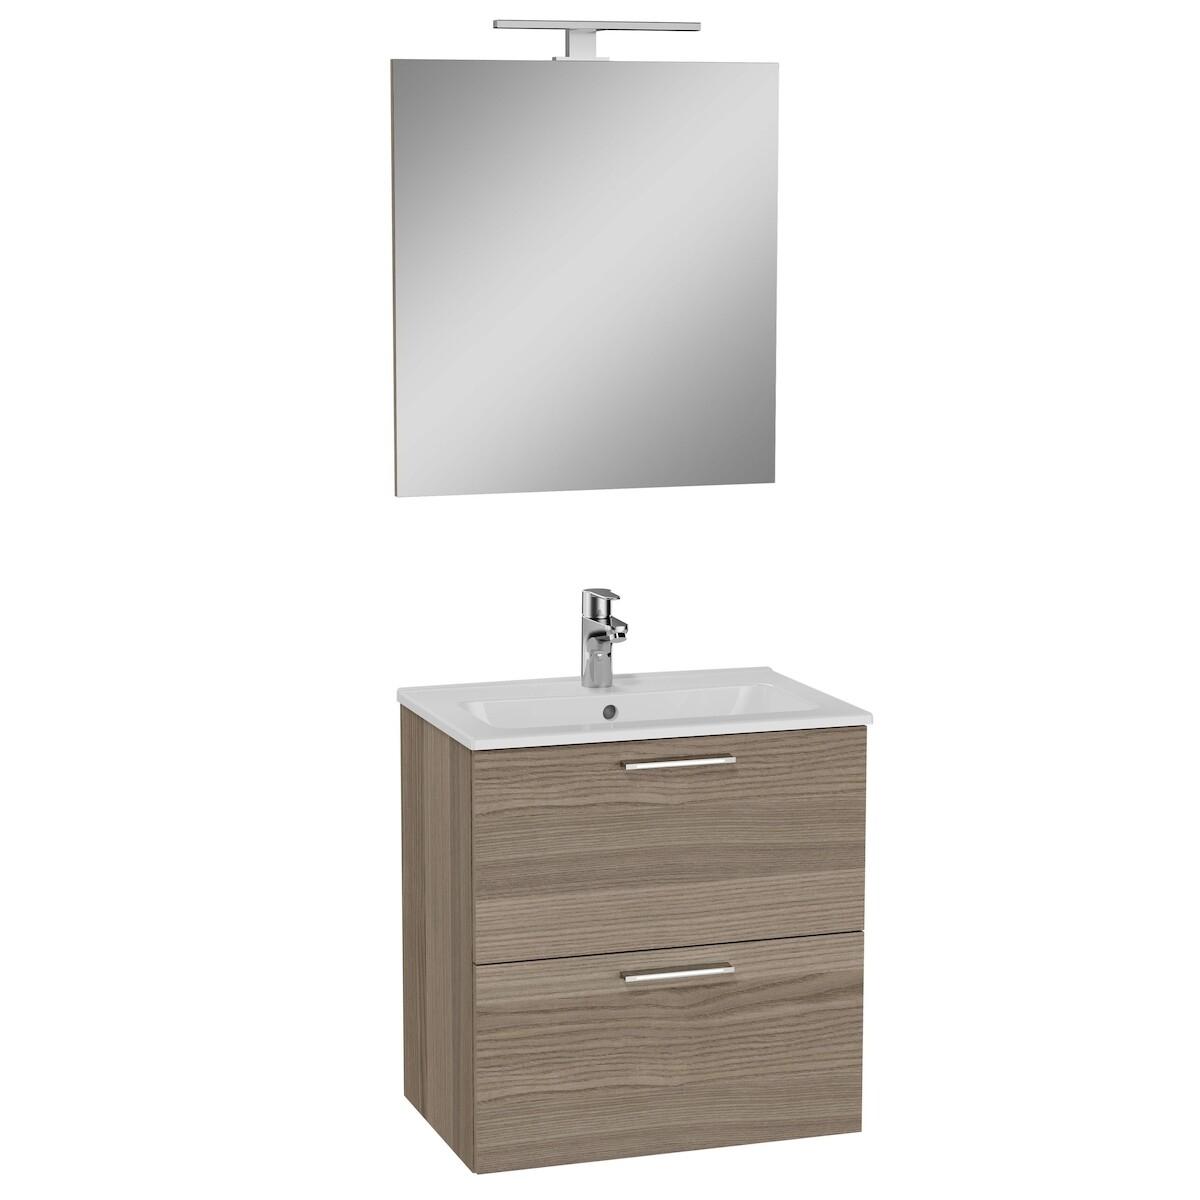 Koupelnová skříňka s umyvadlem zrcadlem a osvětlením 59x61x39,5 cm Vitra Mia cordoba